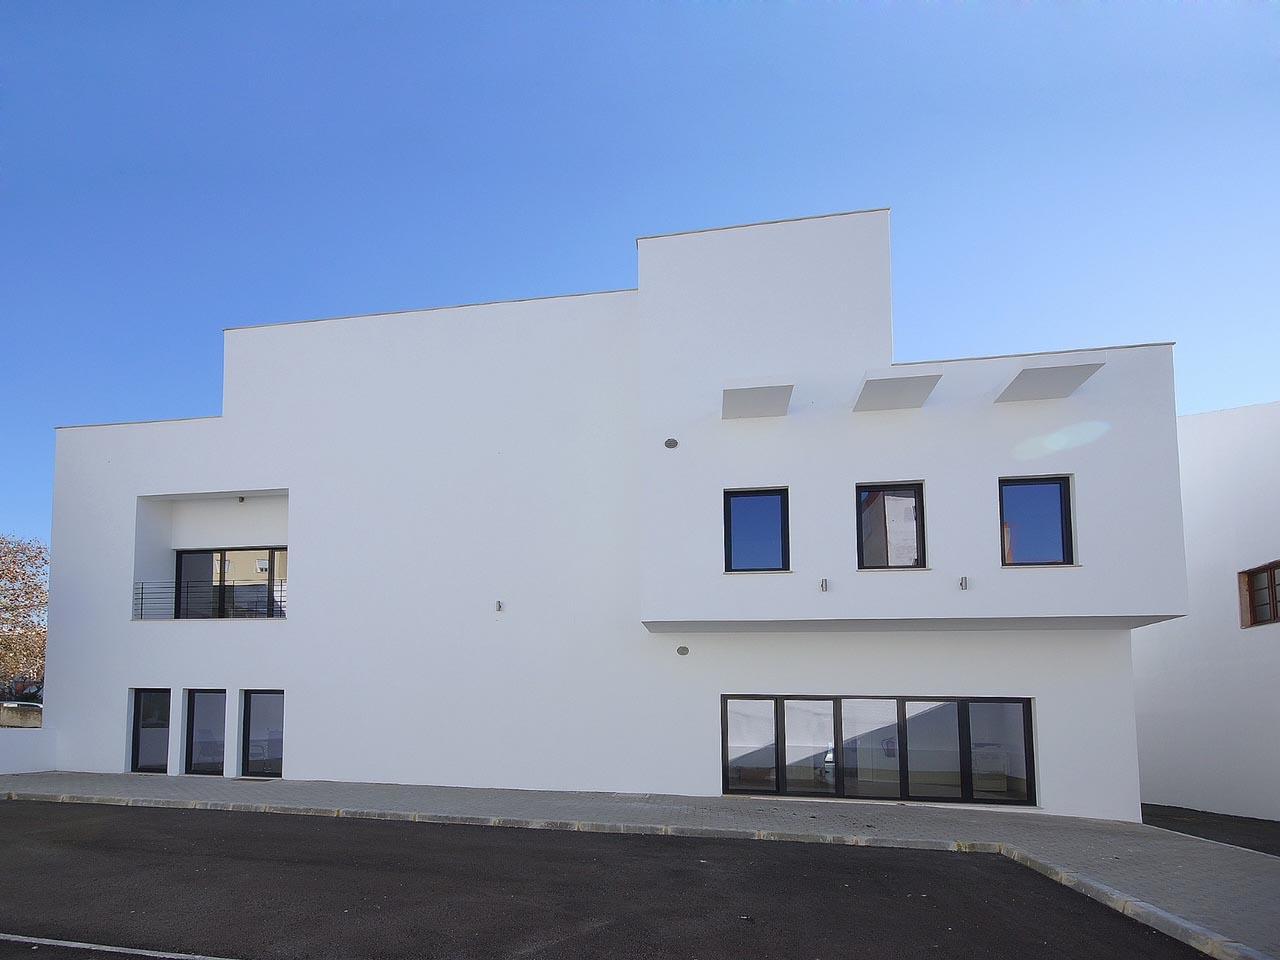 https://www.araujo-arquitectura.pt/wp-content/uploads/2021/01/2.jpg